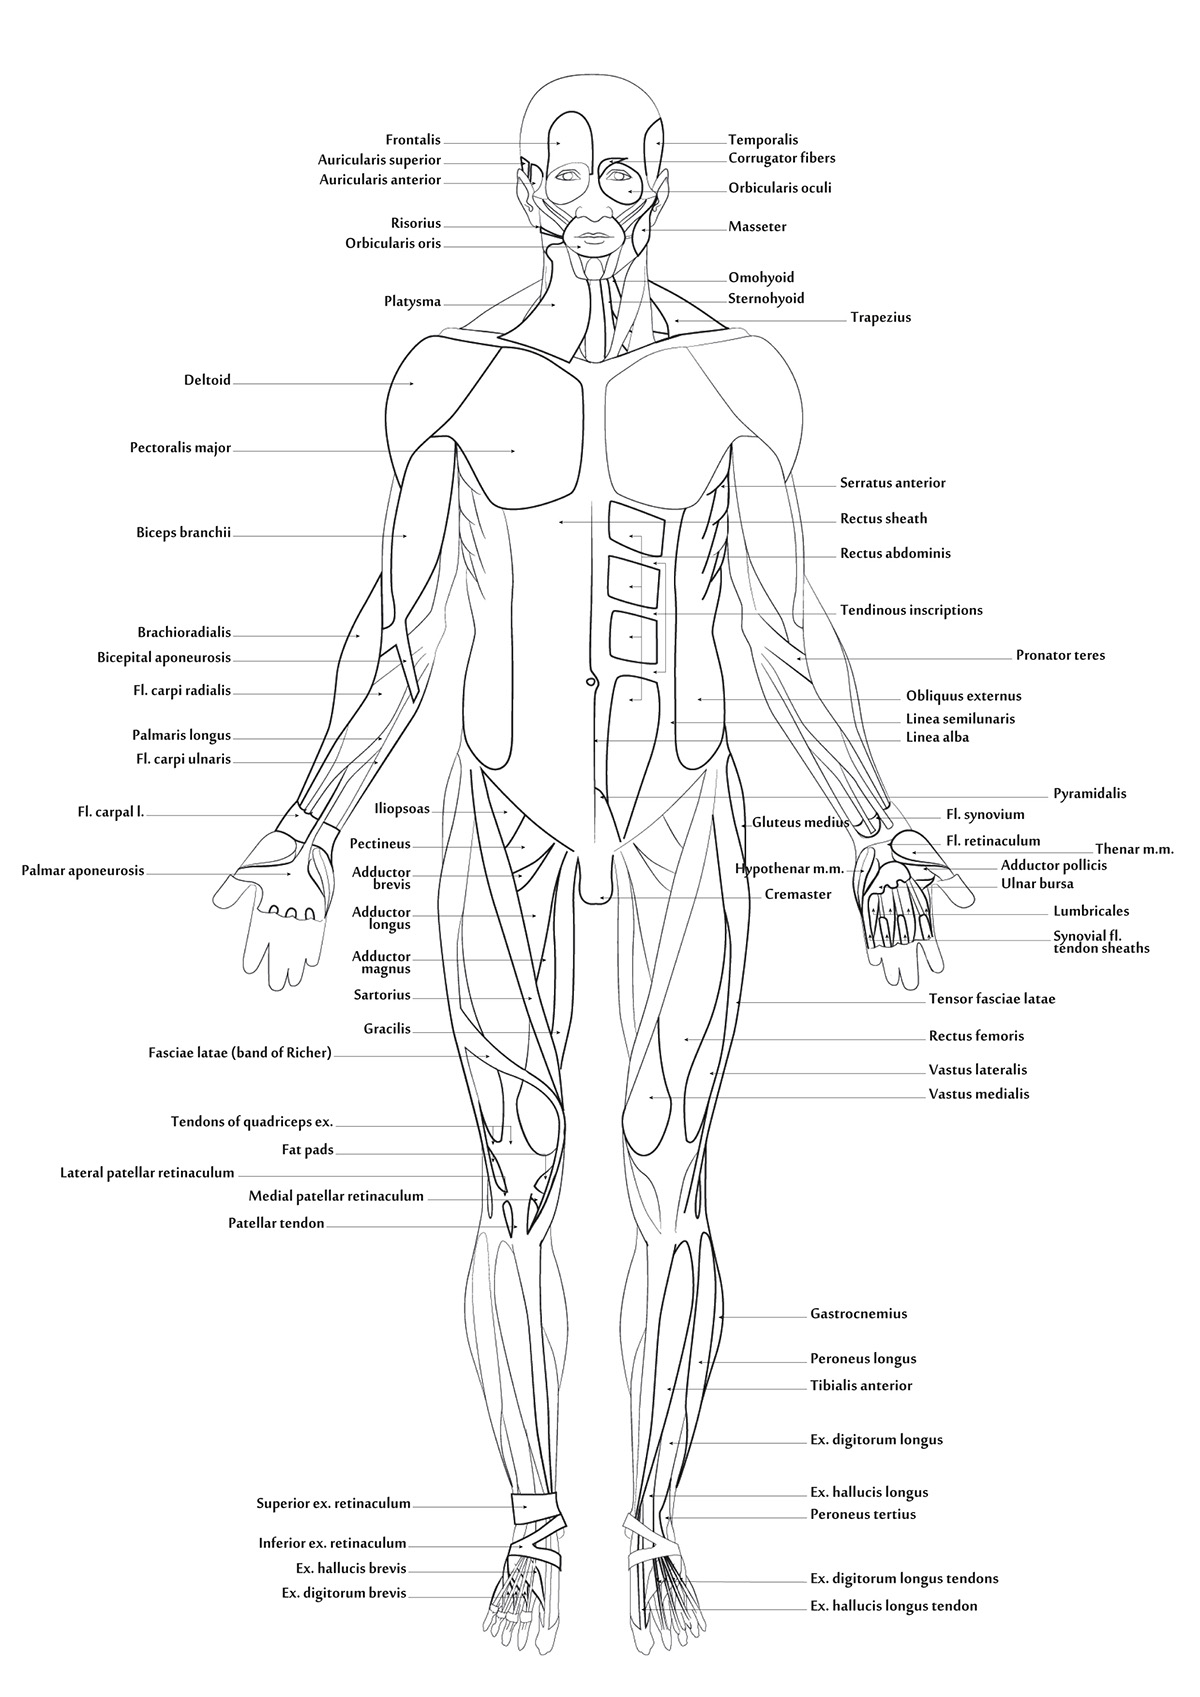 Niedlich Muscular System Drawing Ideen - Anatomie Ideen - finotti.info